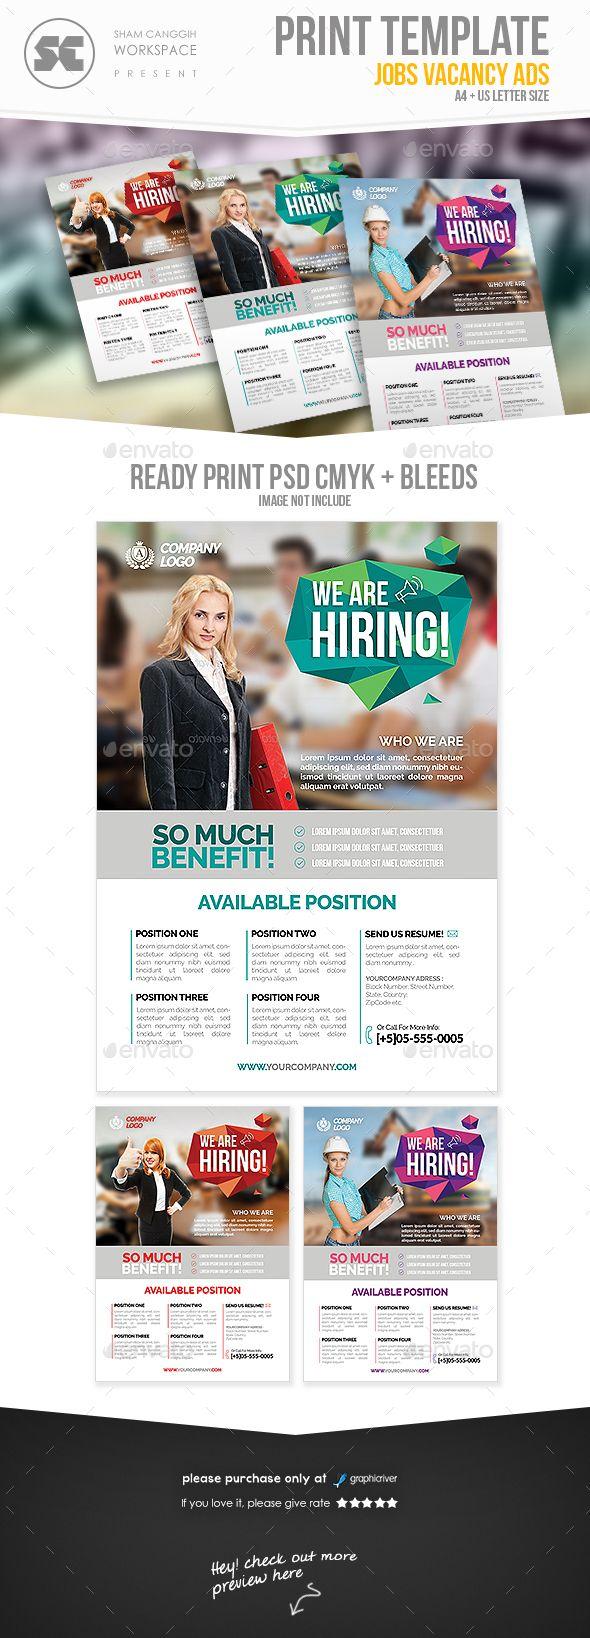 job flyer examples